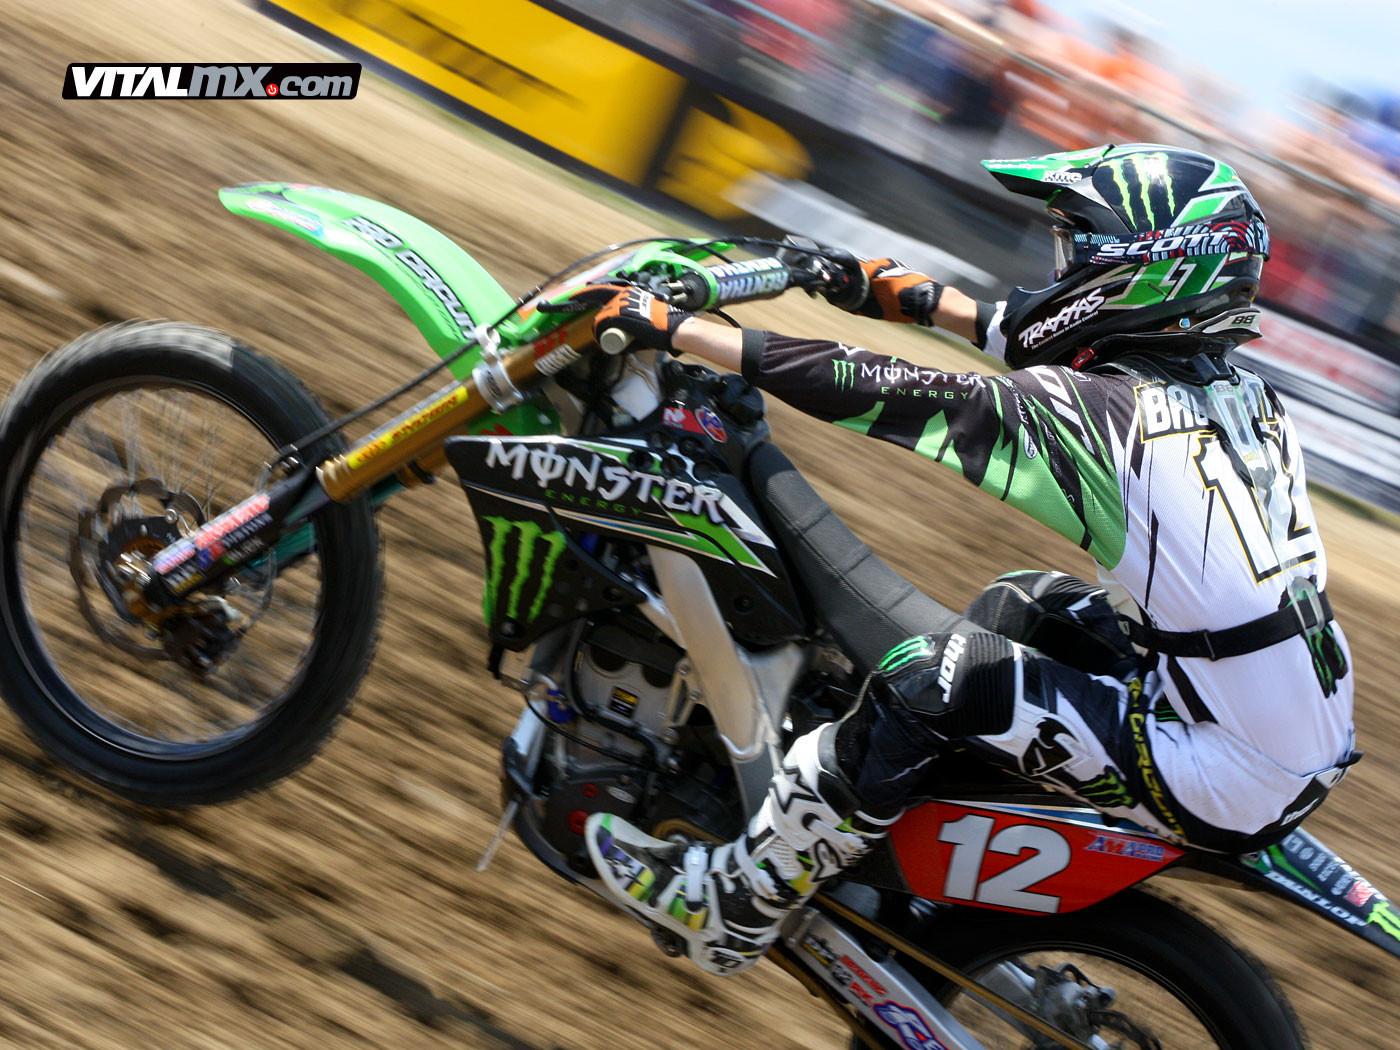 Blake Baggett - Pic 'o The Day: Blake Baggett - Motocross Pictures - Vital MX